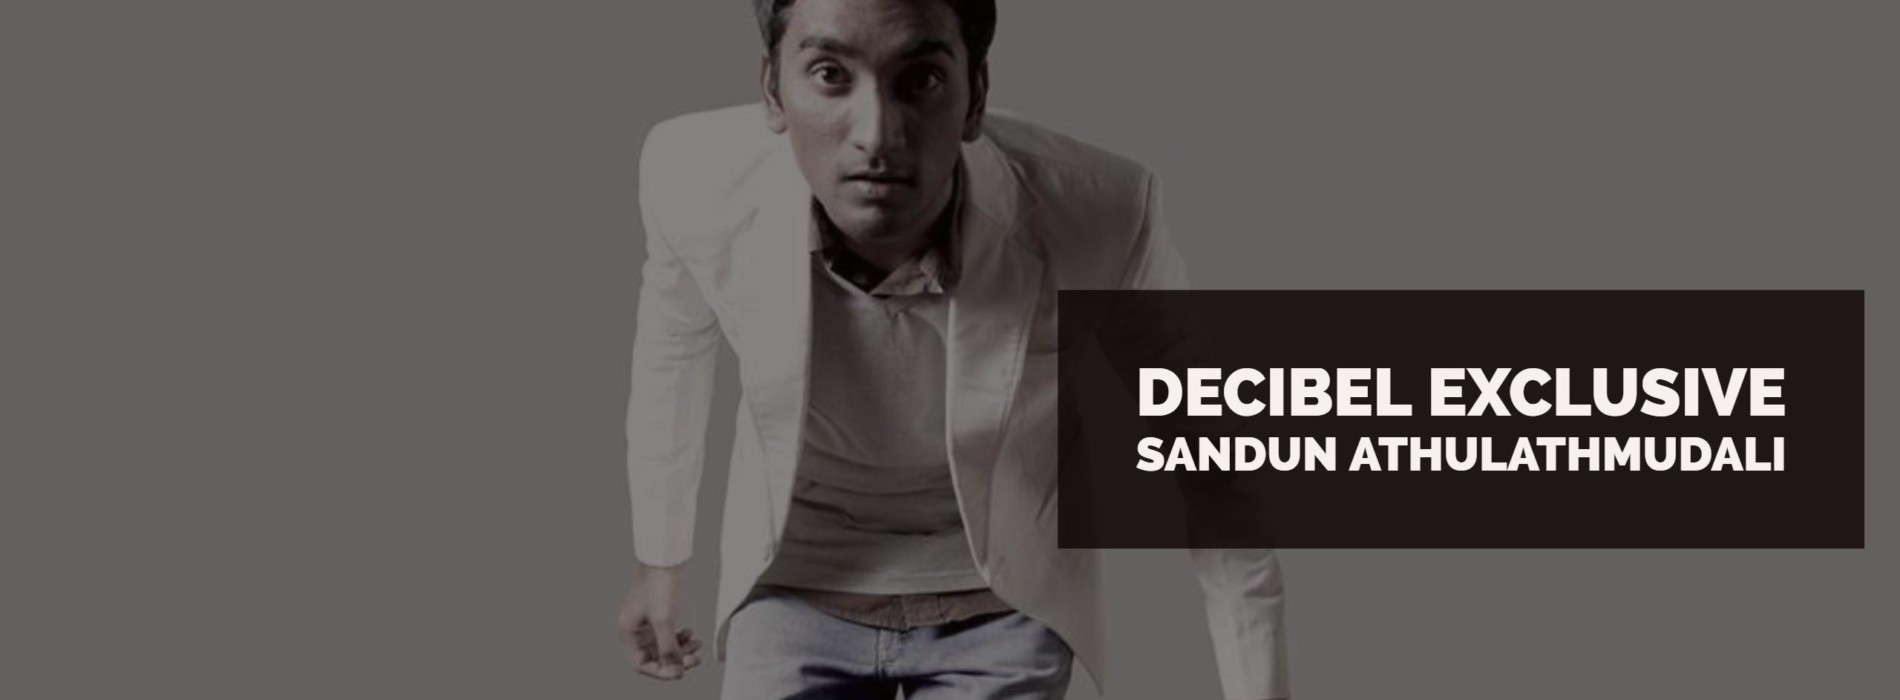 Decibel Exclusive : Sandun Athulathmudali